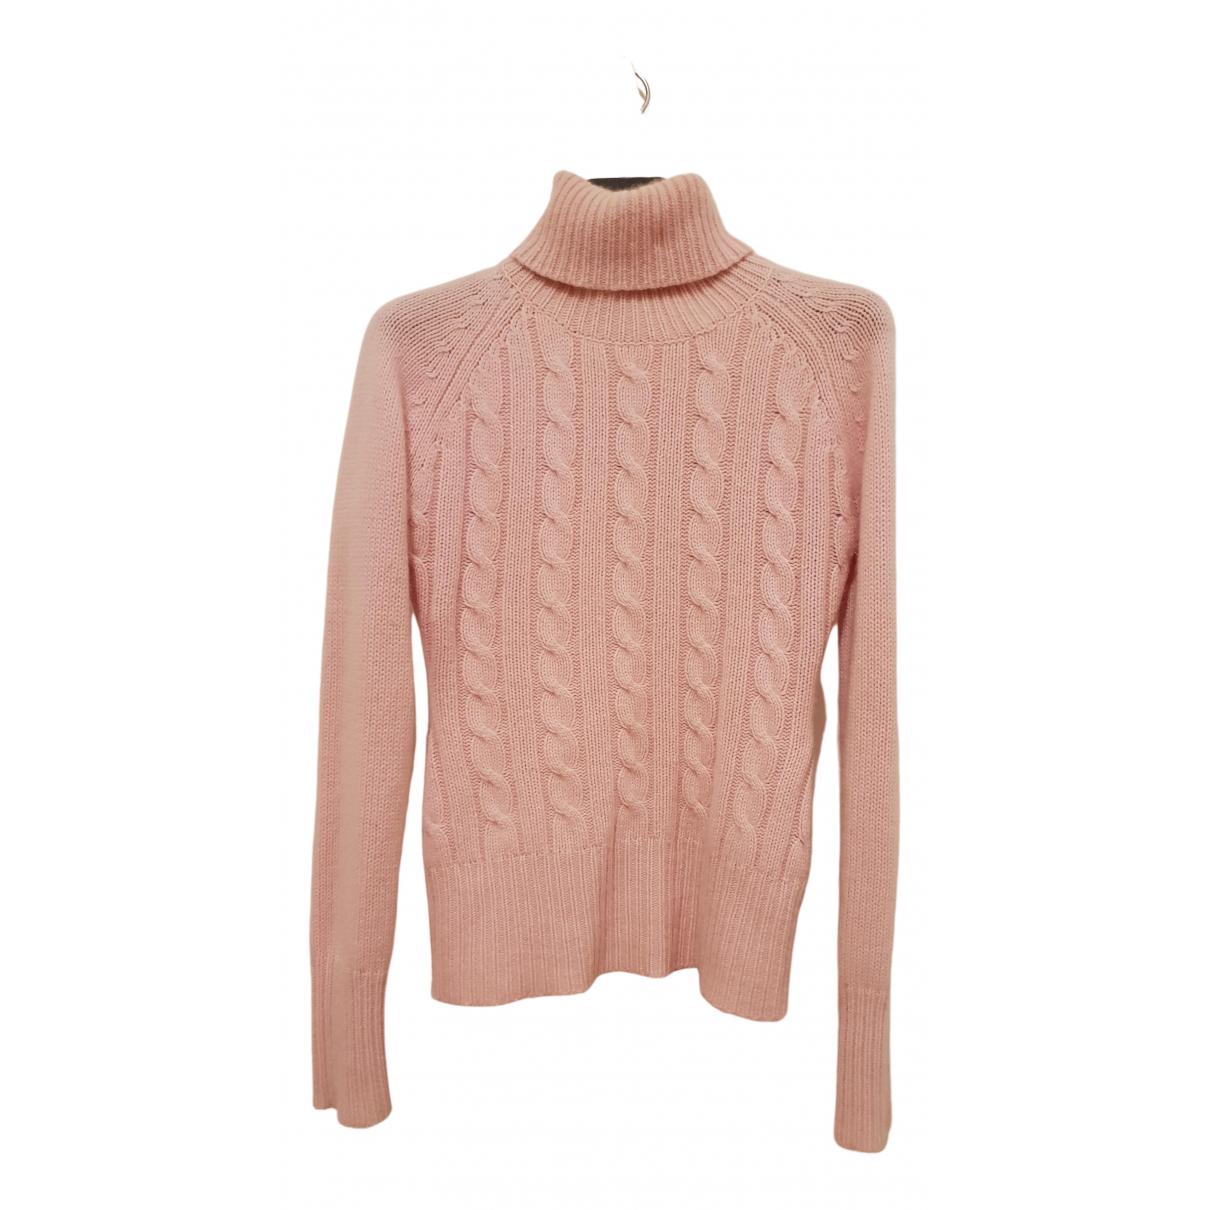 Matthew Williamson N Pink Cashmere Knitwear for Women 8 US